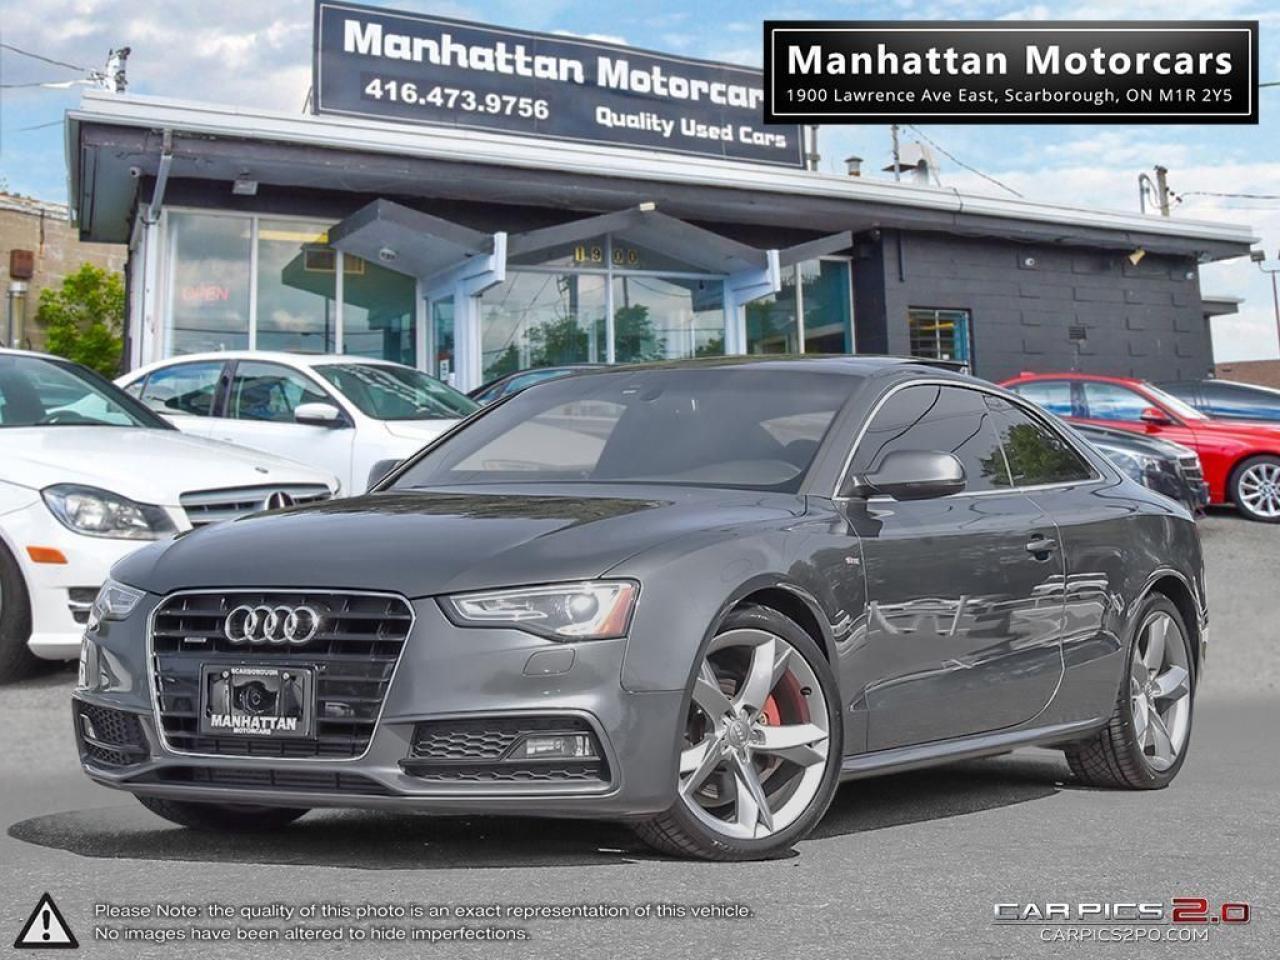 2013 Audi A5 2.0T QUATTRO S-LINE |6 SPEED|PANO|PHONE|NOACCIDENT